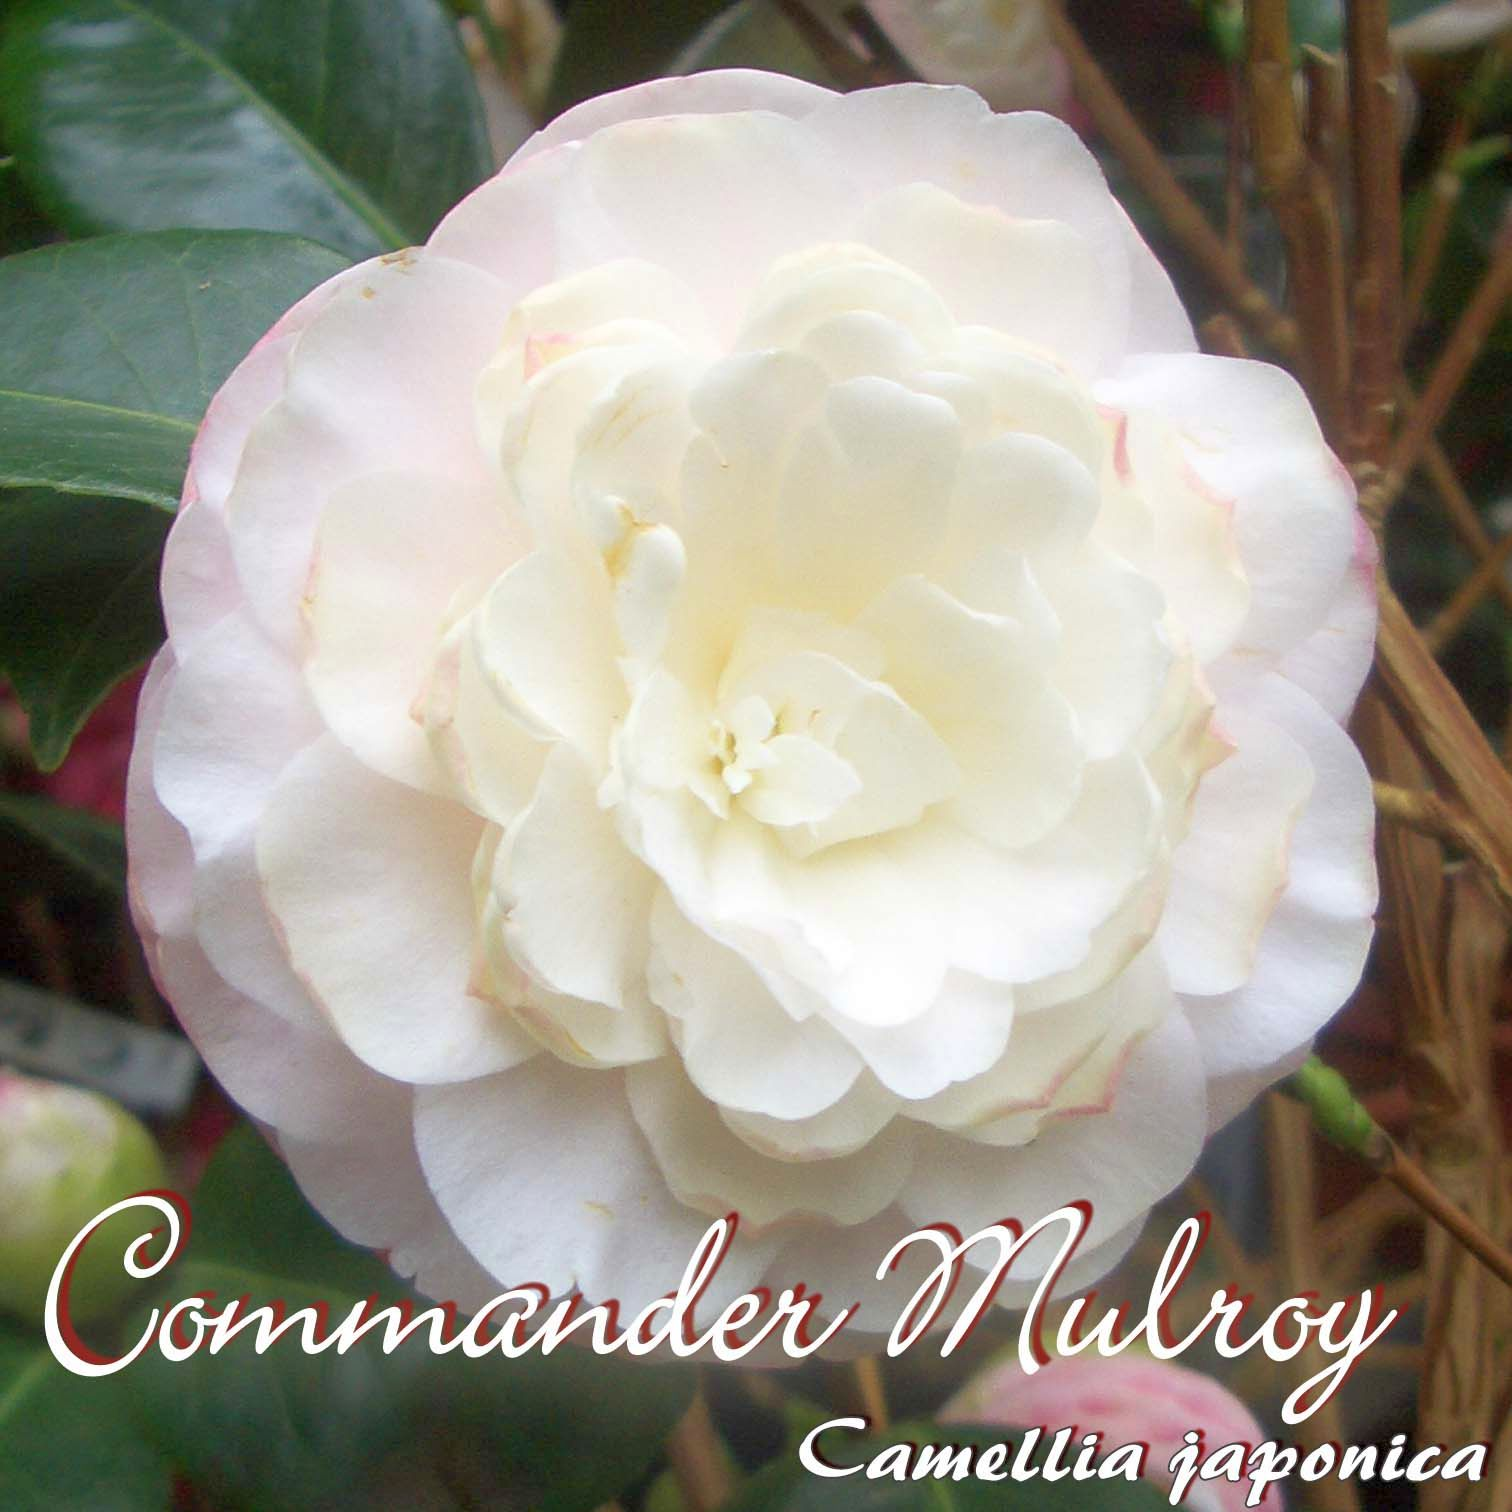 "4 bis 5-jährige Pflanze Camellia japonica Kamelie /""Commander Mulroy/"""